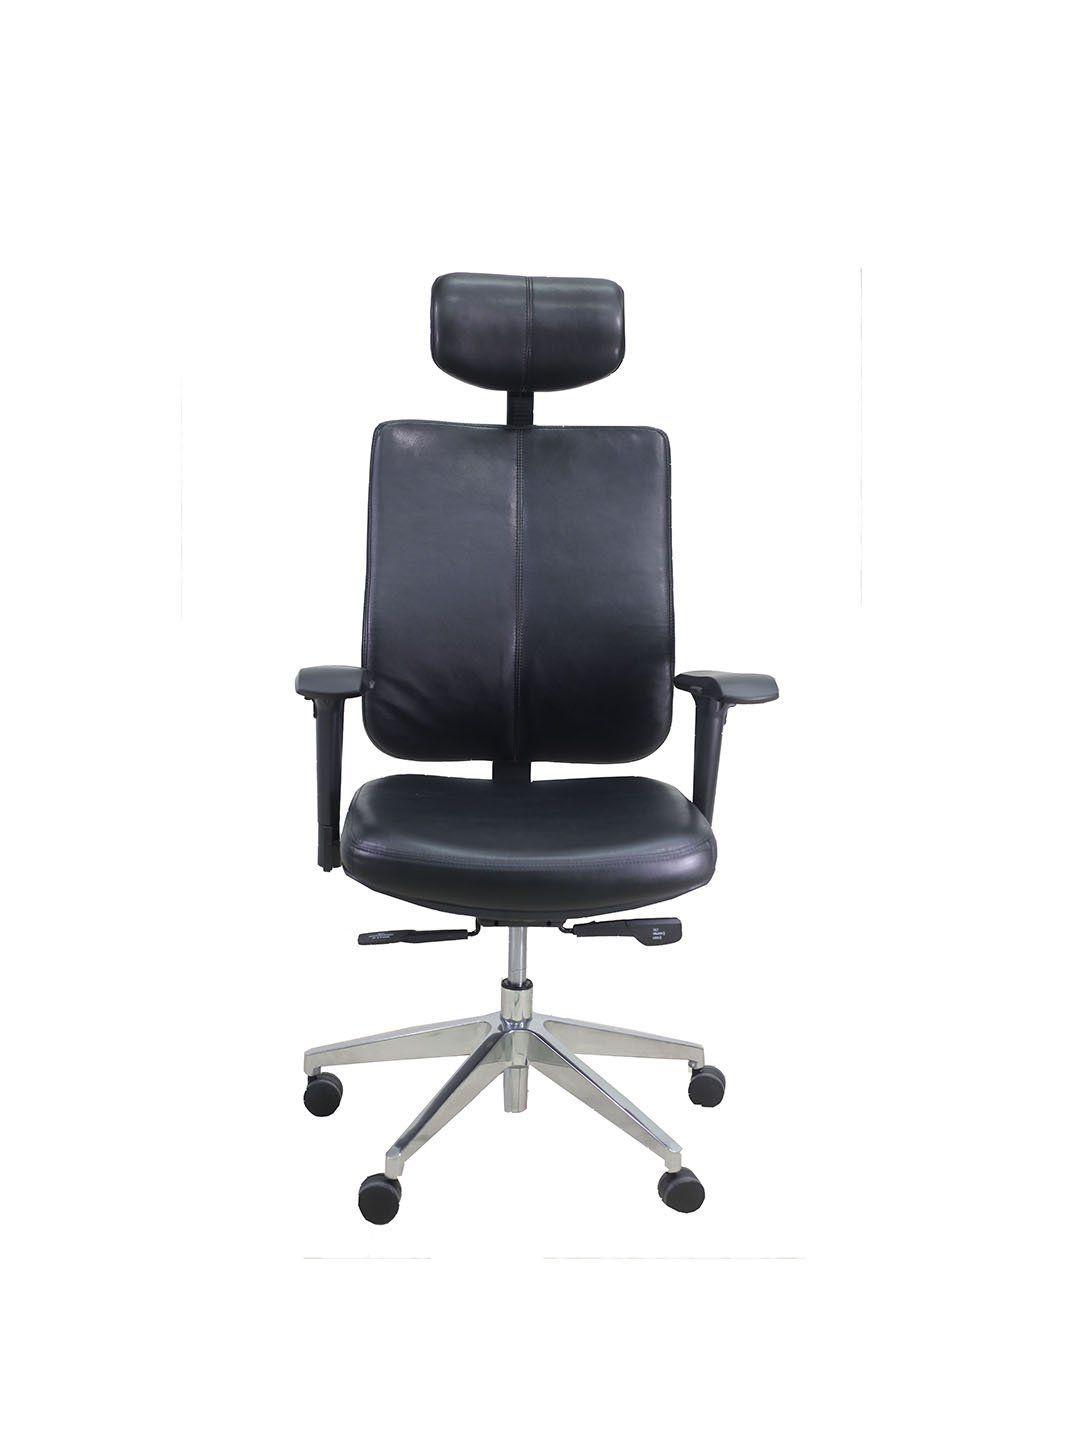 executive ergonomic chair with lumbar support ergonomicchairs